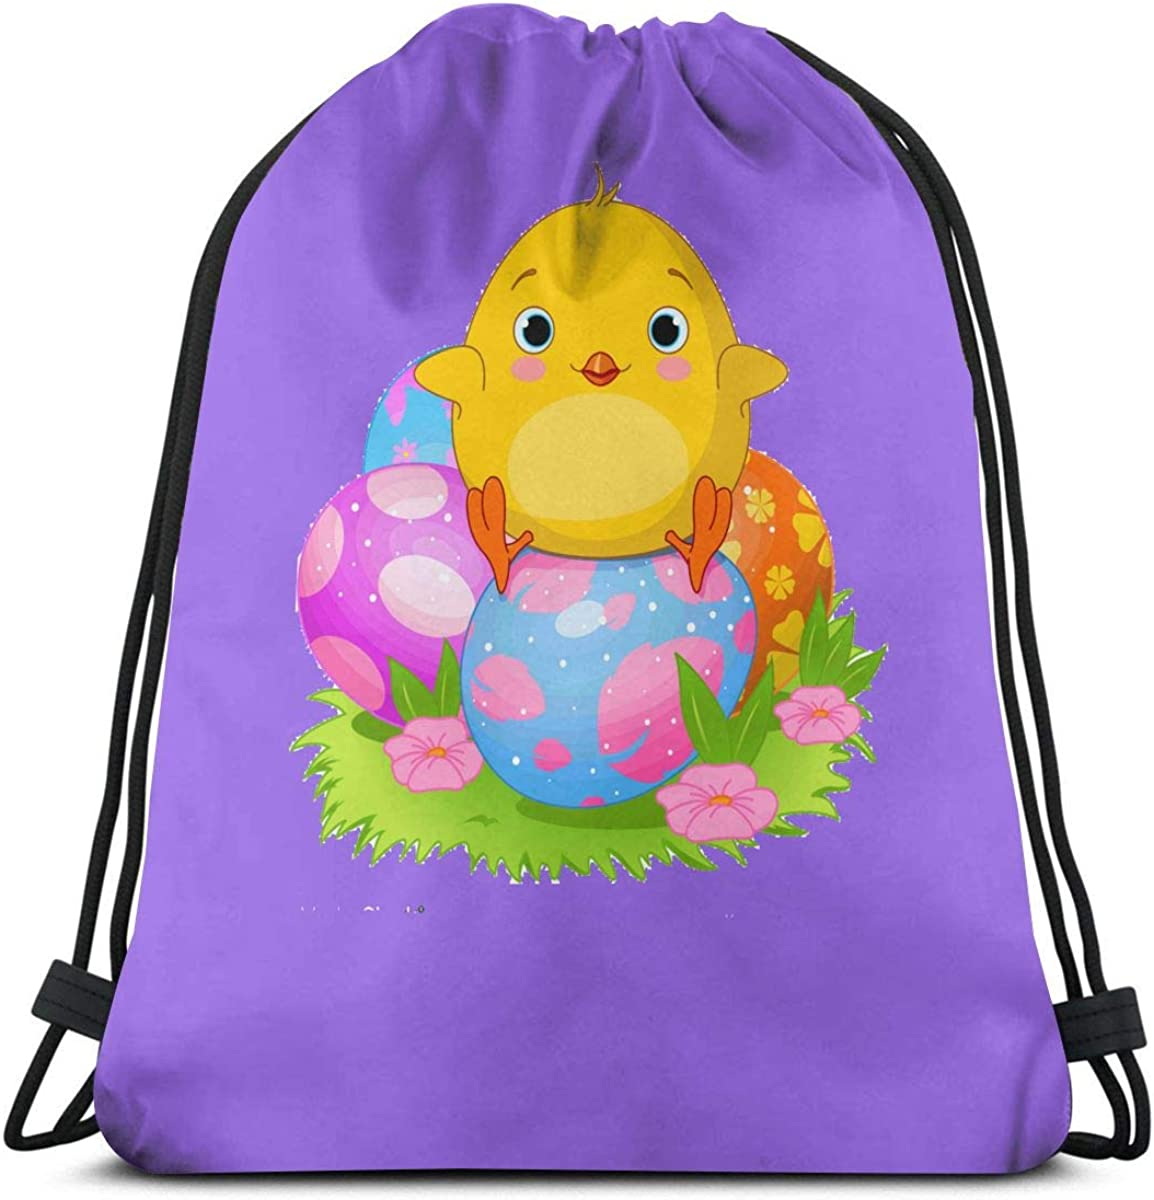 Drawstring Backpack Chicken Eggs Pattern Gym Bag